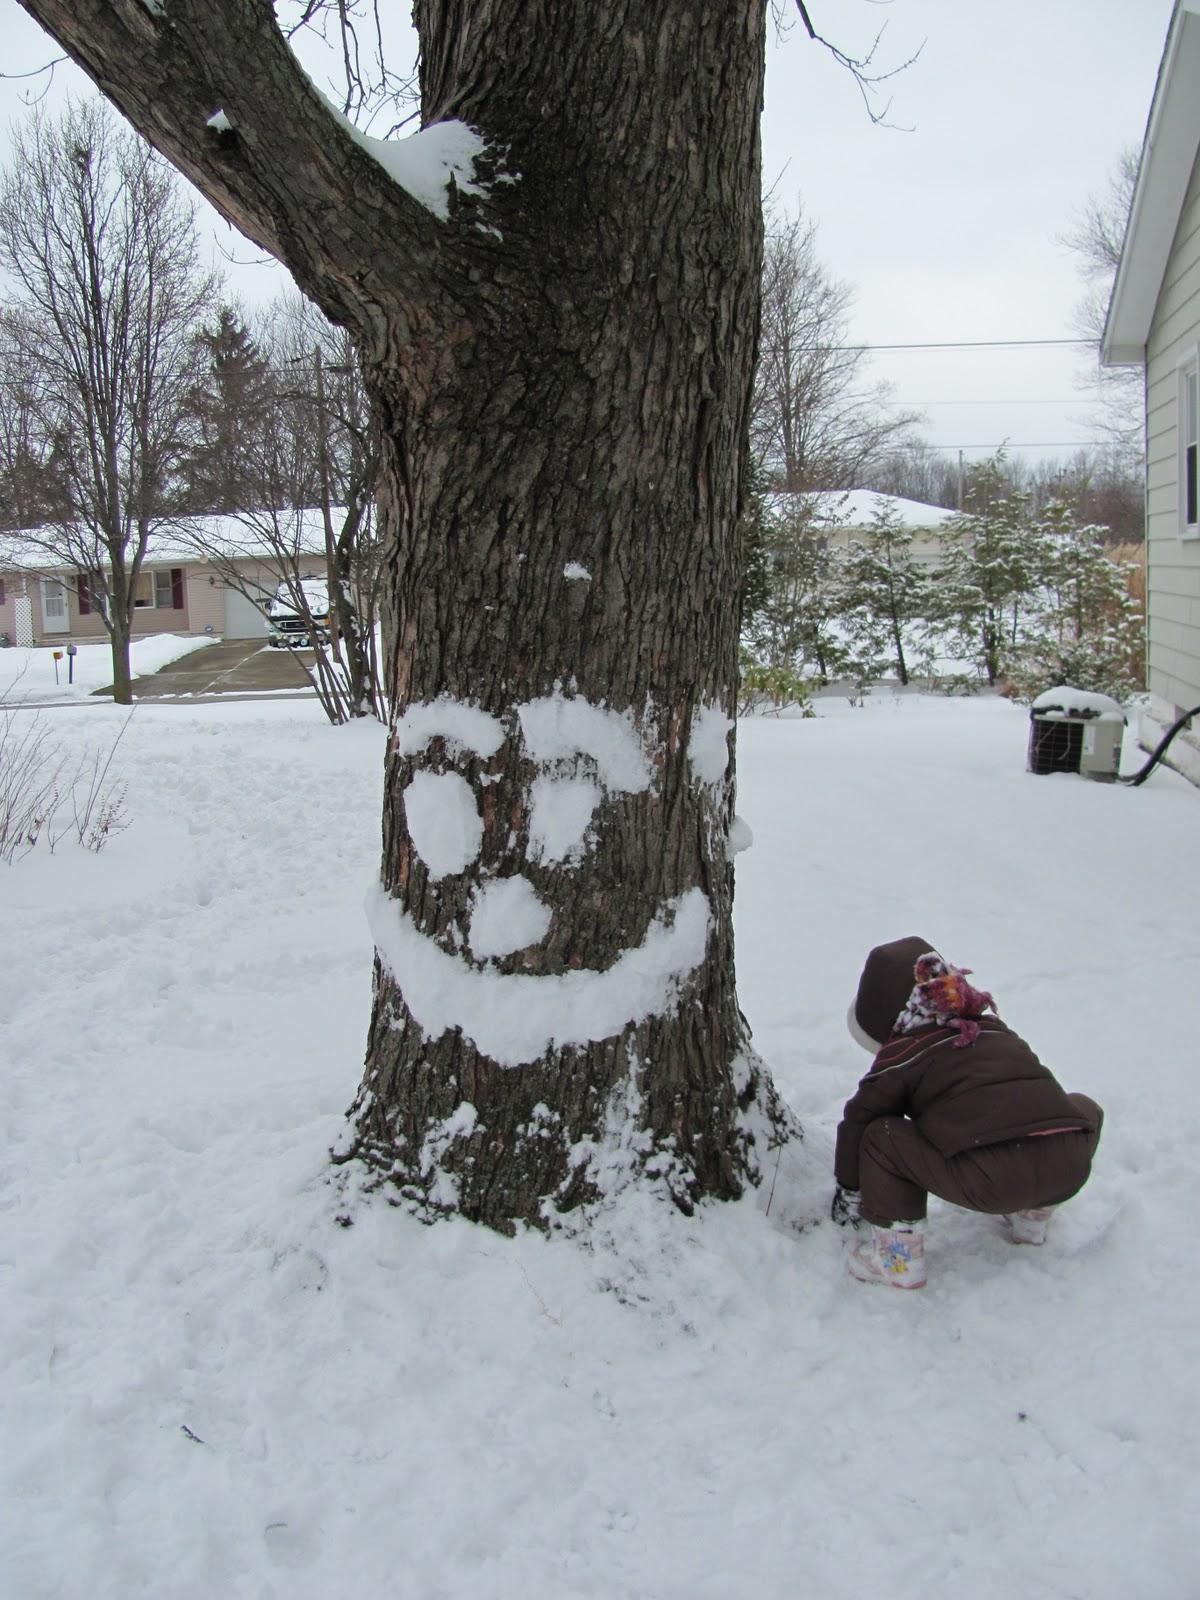 Do you wanna build a snowman? on Pinterest   Snowman, Snow ...  Snowman Too Much Snow